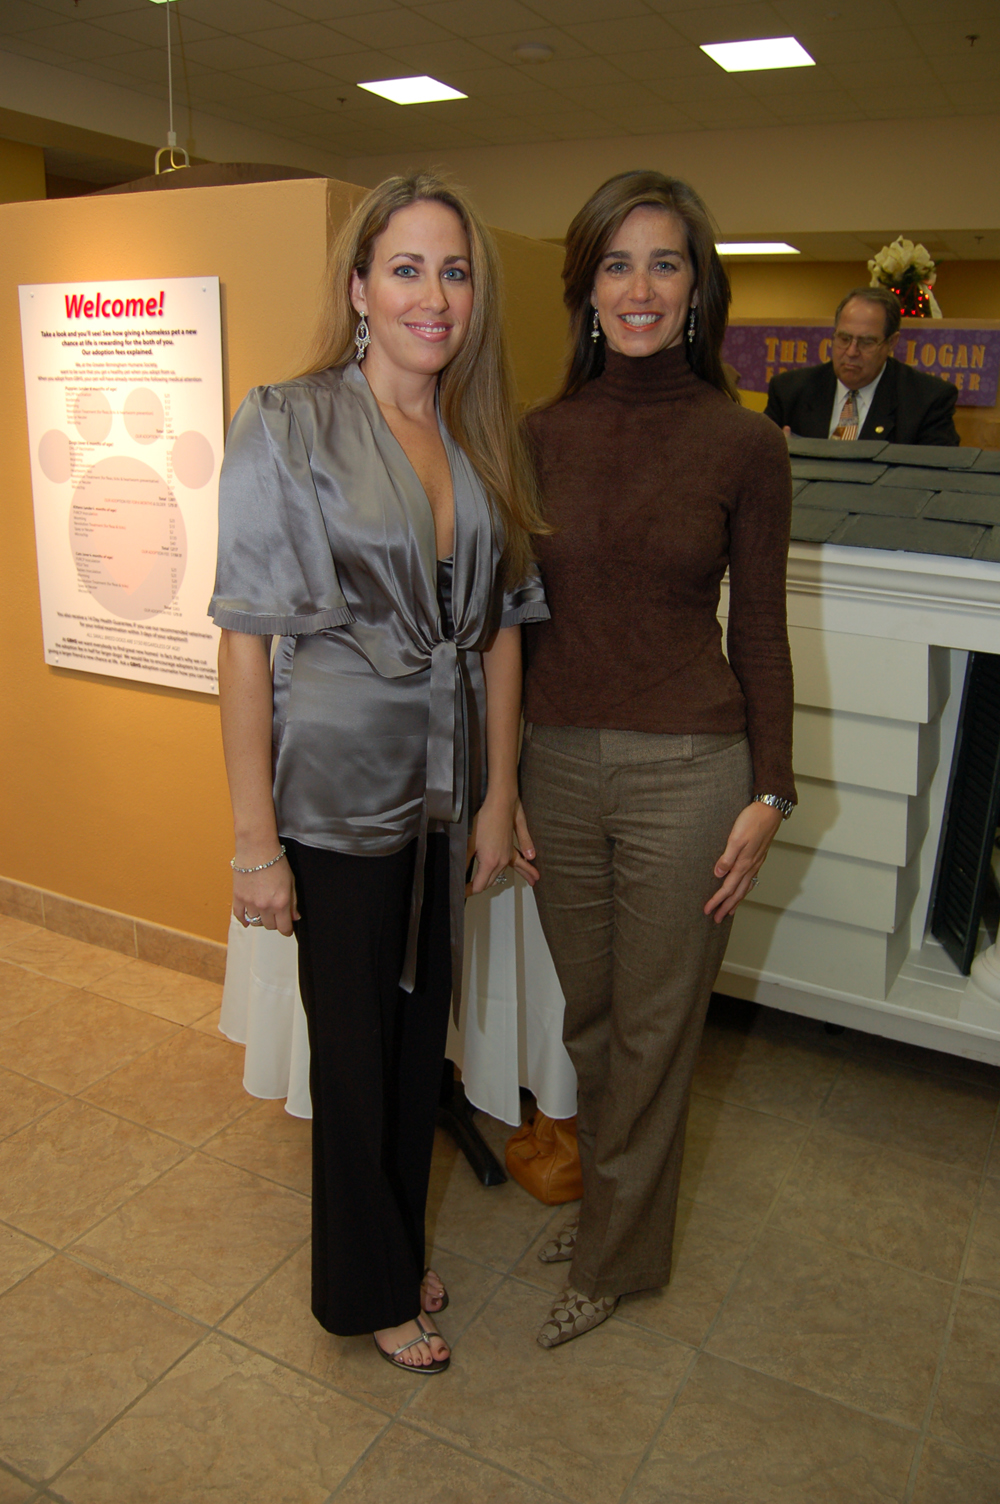 Julie Elliott and Laura Norred